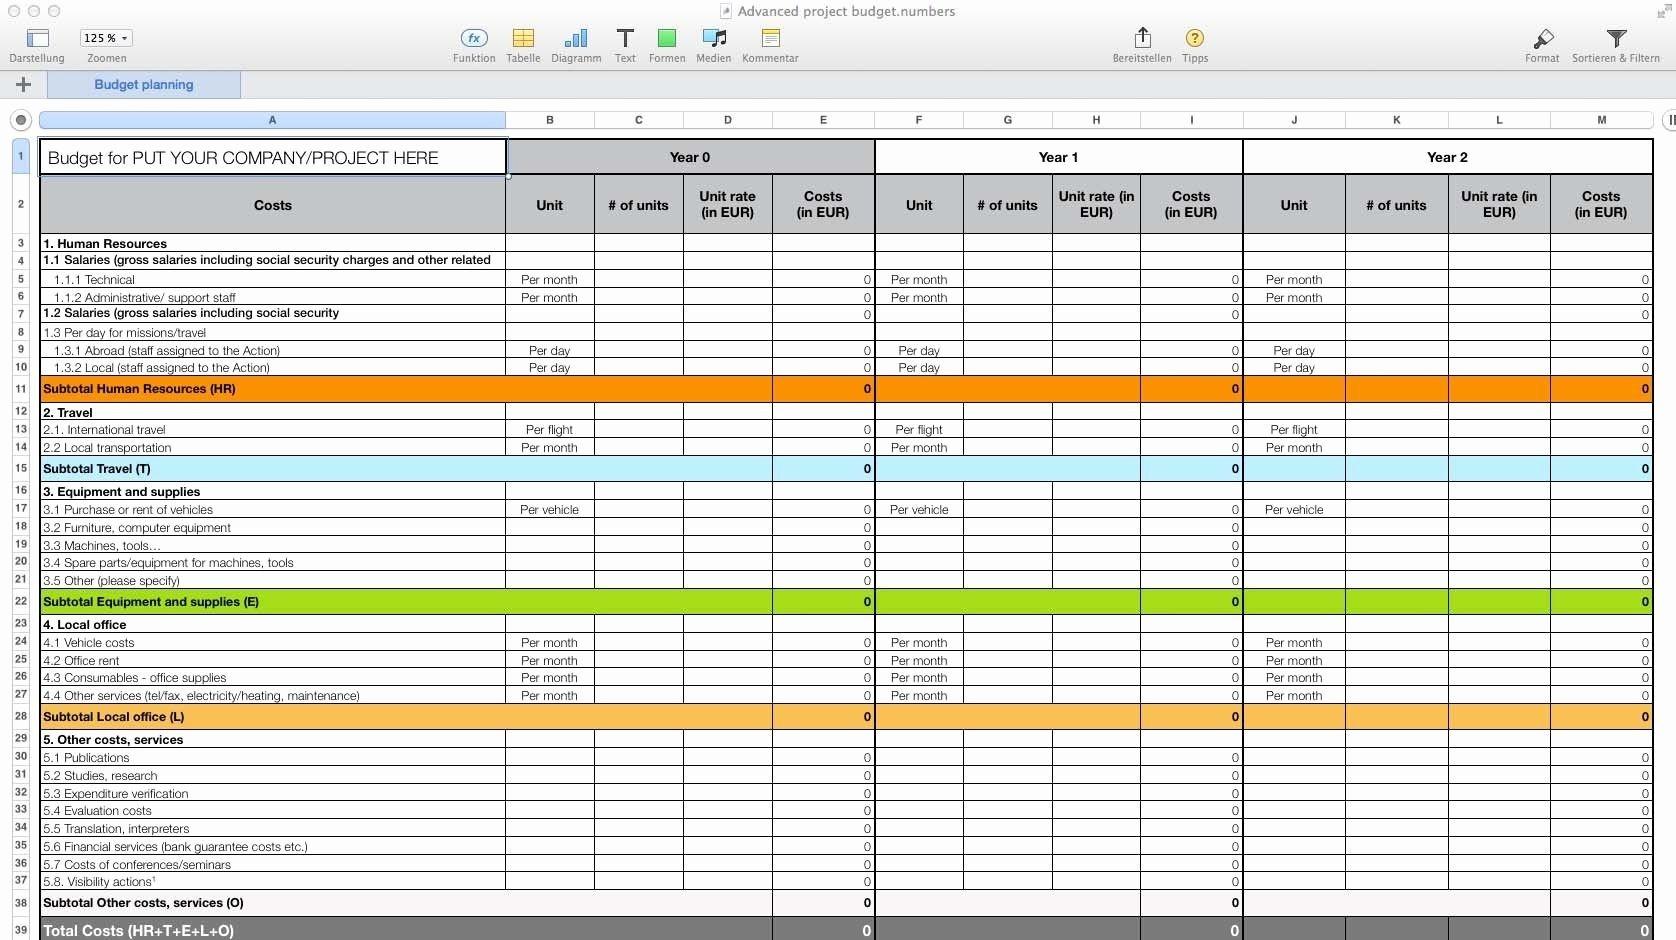 Free Budget Spreadsheet For Mac In 2020 | Budget Spreadsheet  Depot Administration Calendar Free Pdf